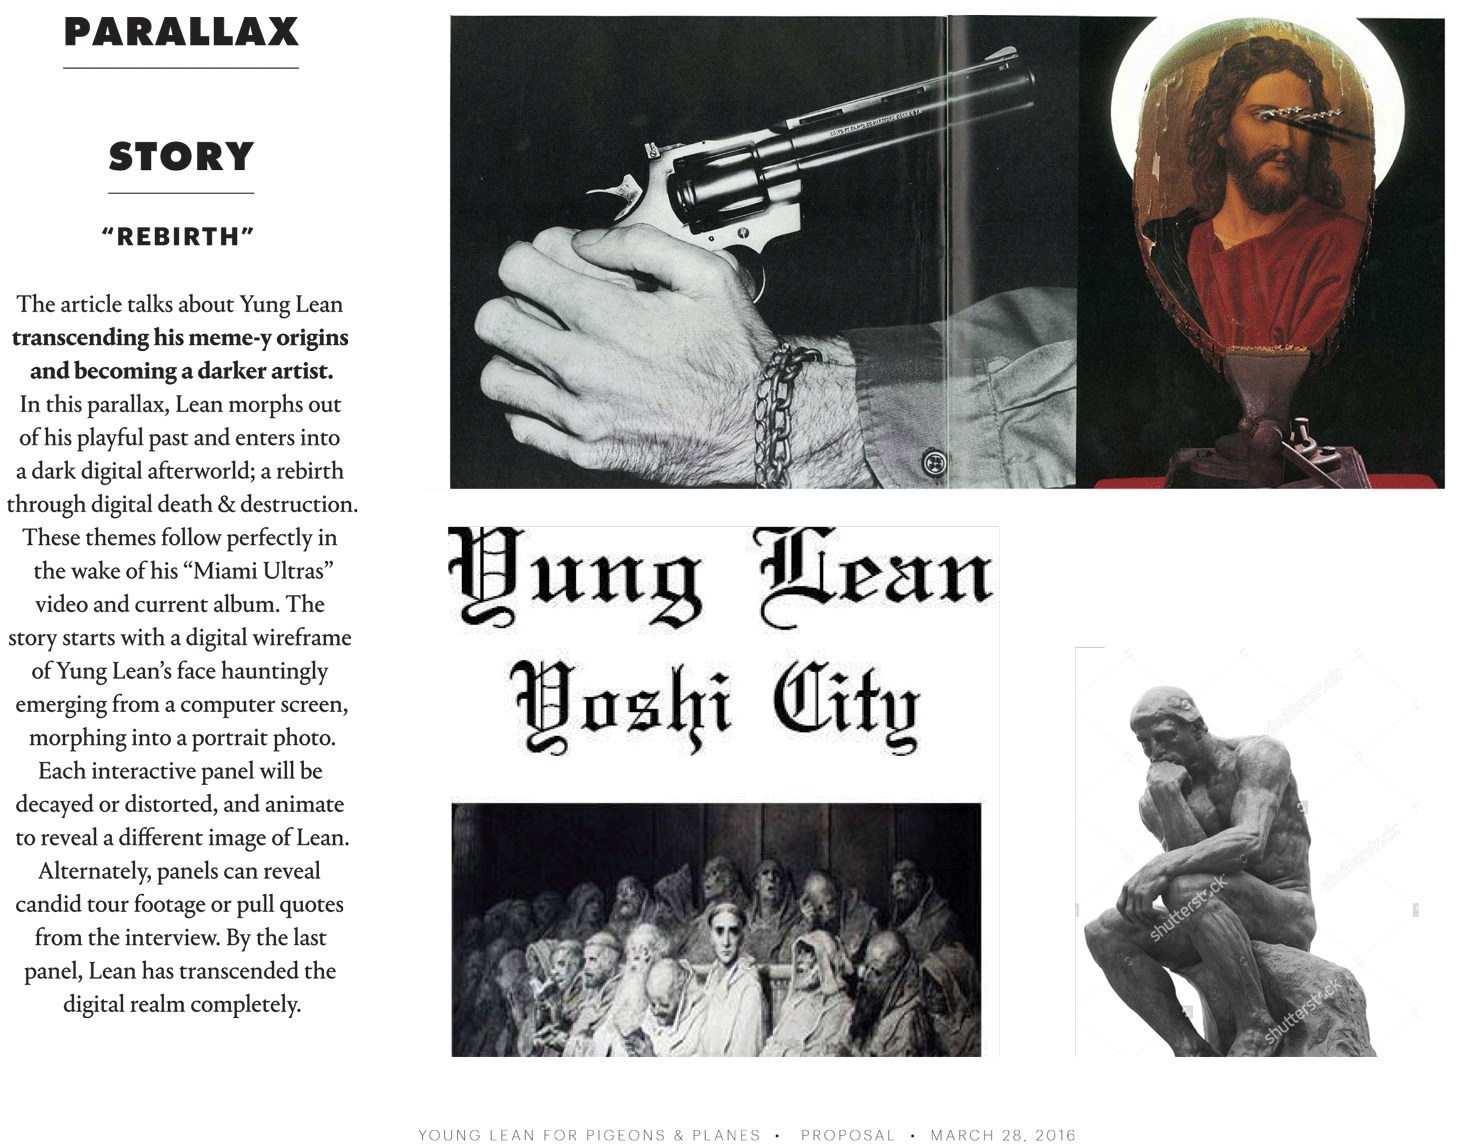 YungLean_Proposal_v2-3.png